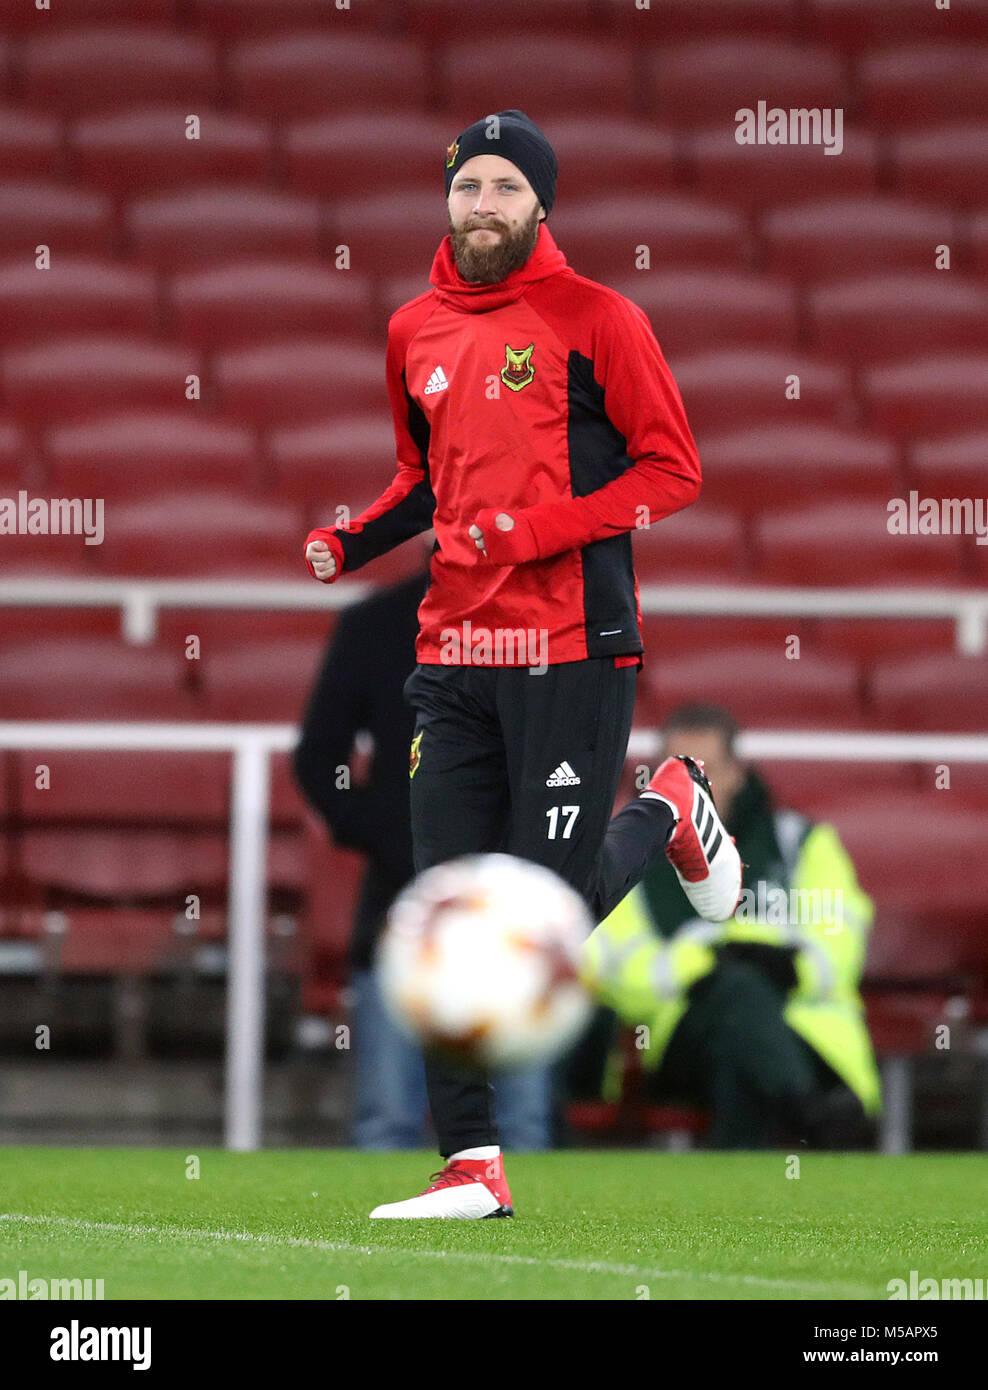 Ostersunds FK è Curtis Edwards durante la sessione di formazione presso l'Emirates Stadium, Londra. Foto Stock